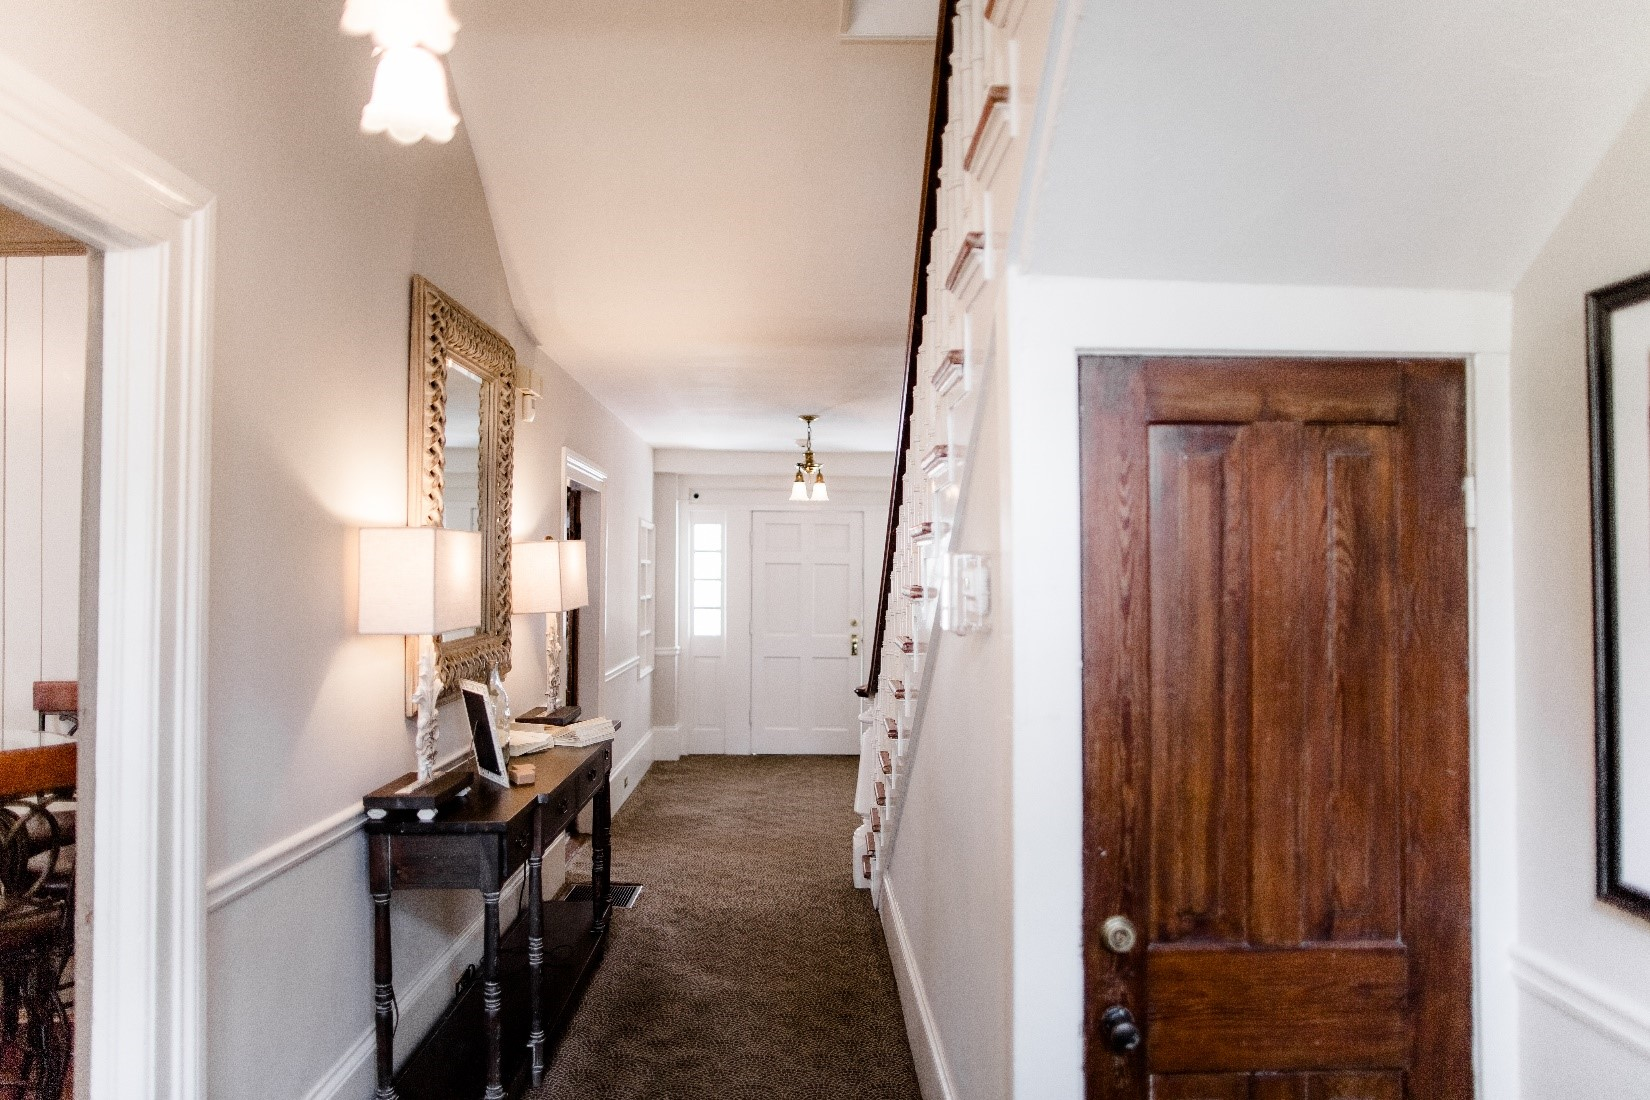 Hallway of House.jpg